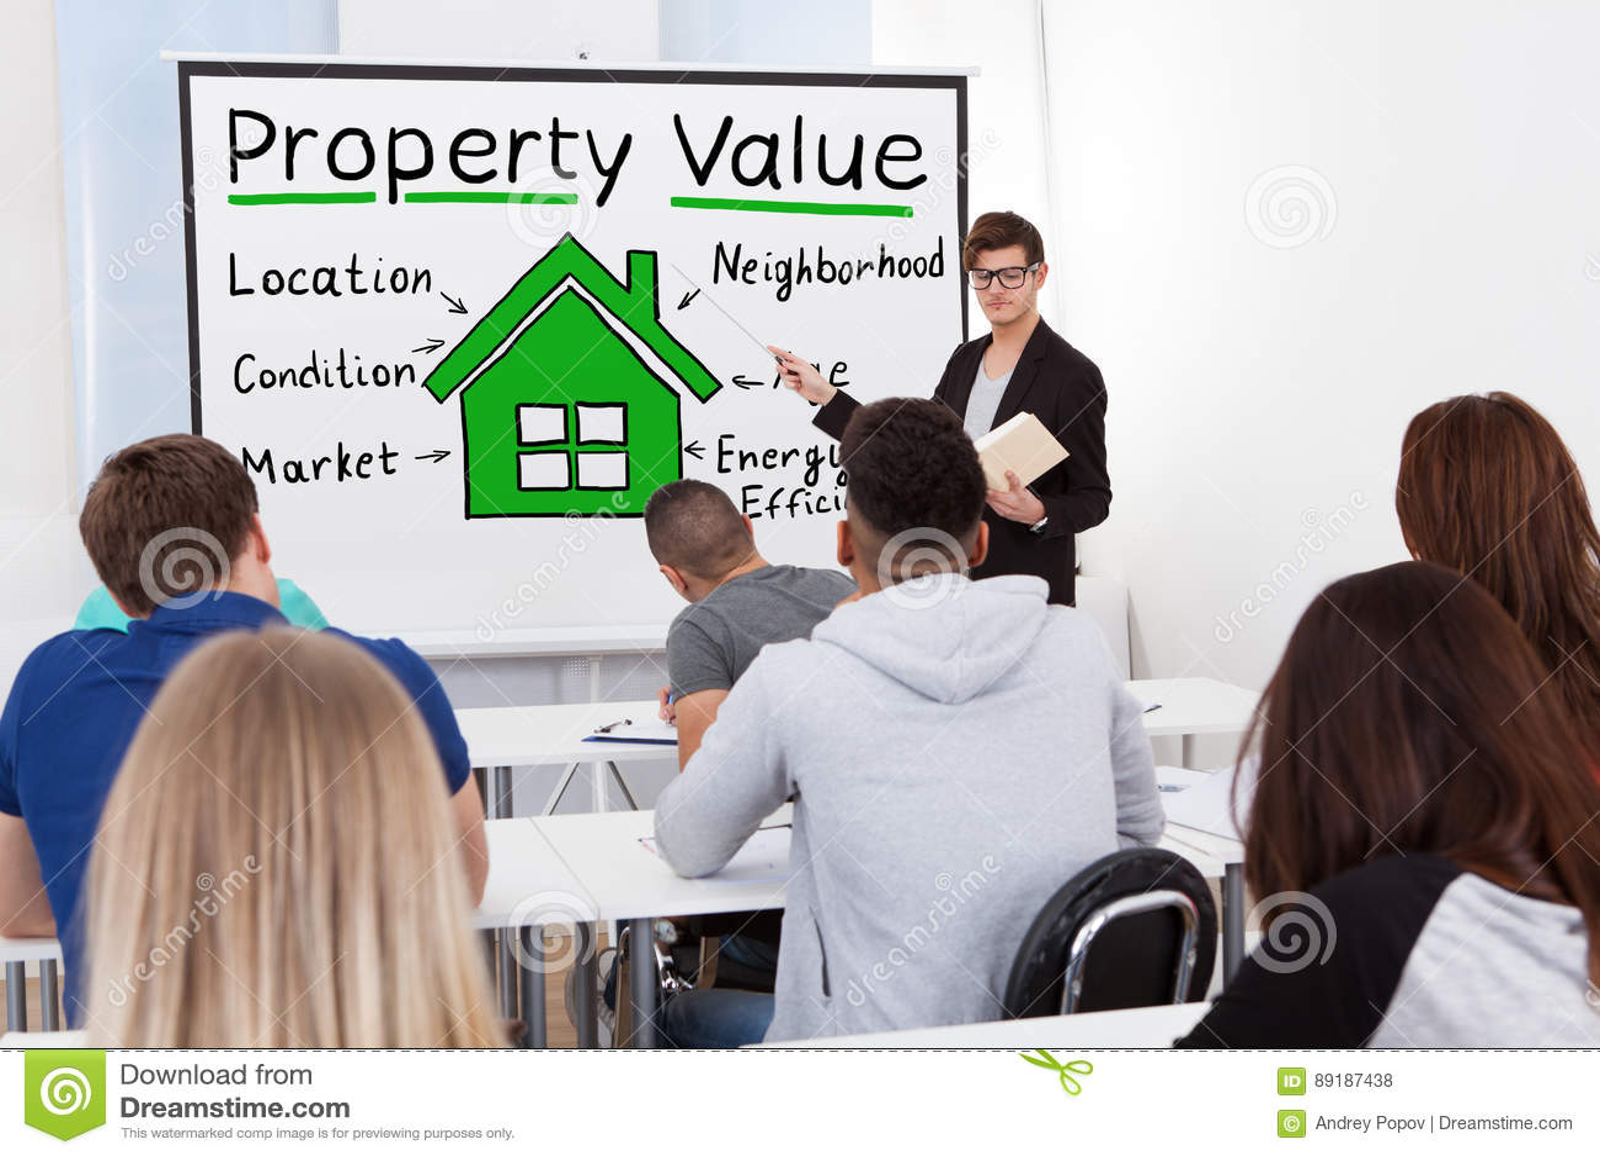 Professor masculino Teaching Property Value aos estudantes